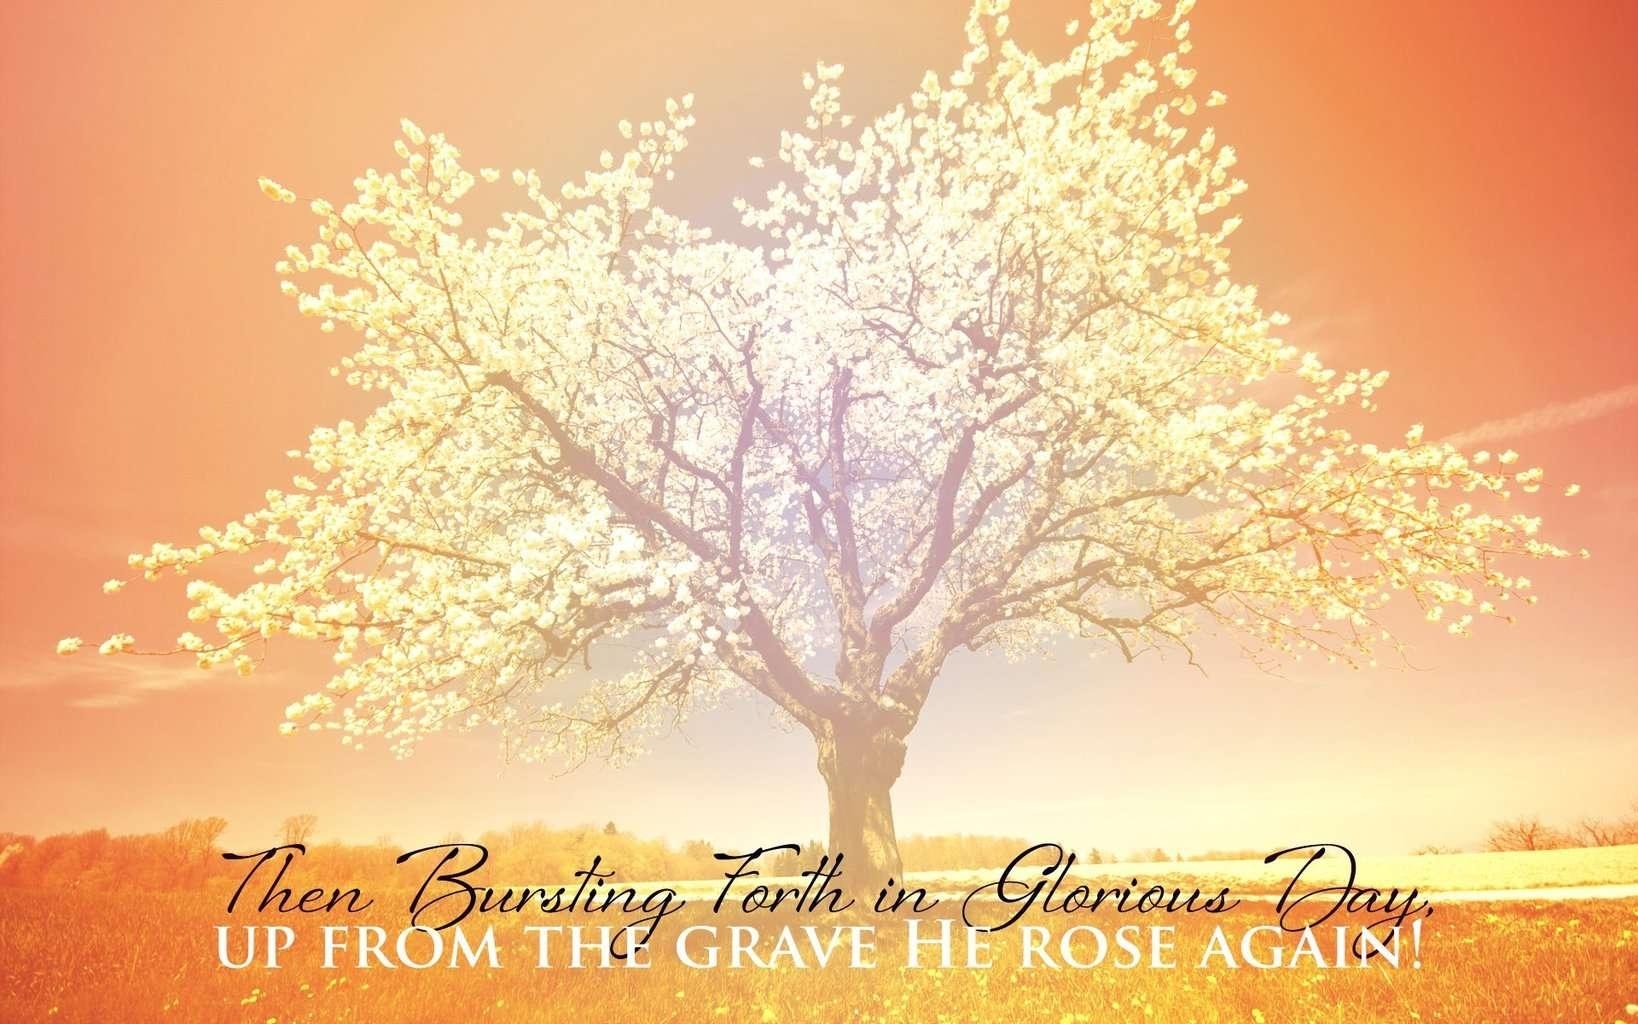 Free Christian Desktop Calendar Wallpaper-56U8U1S - Easter